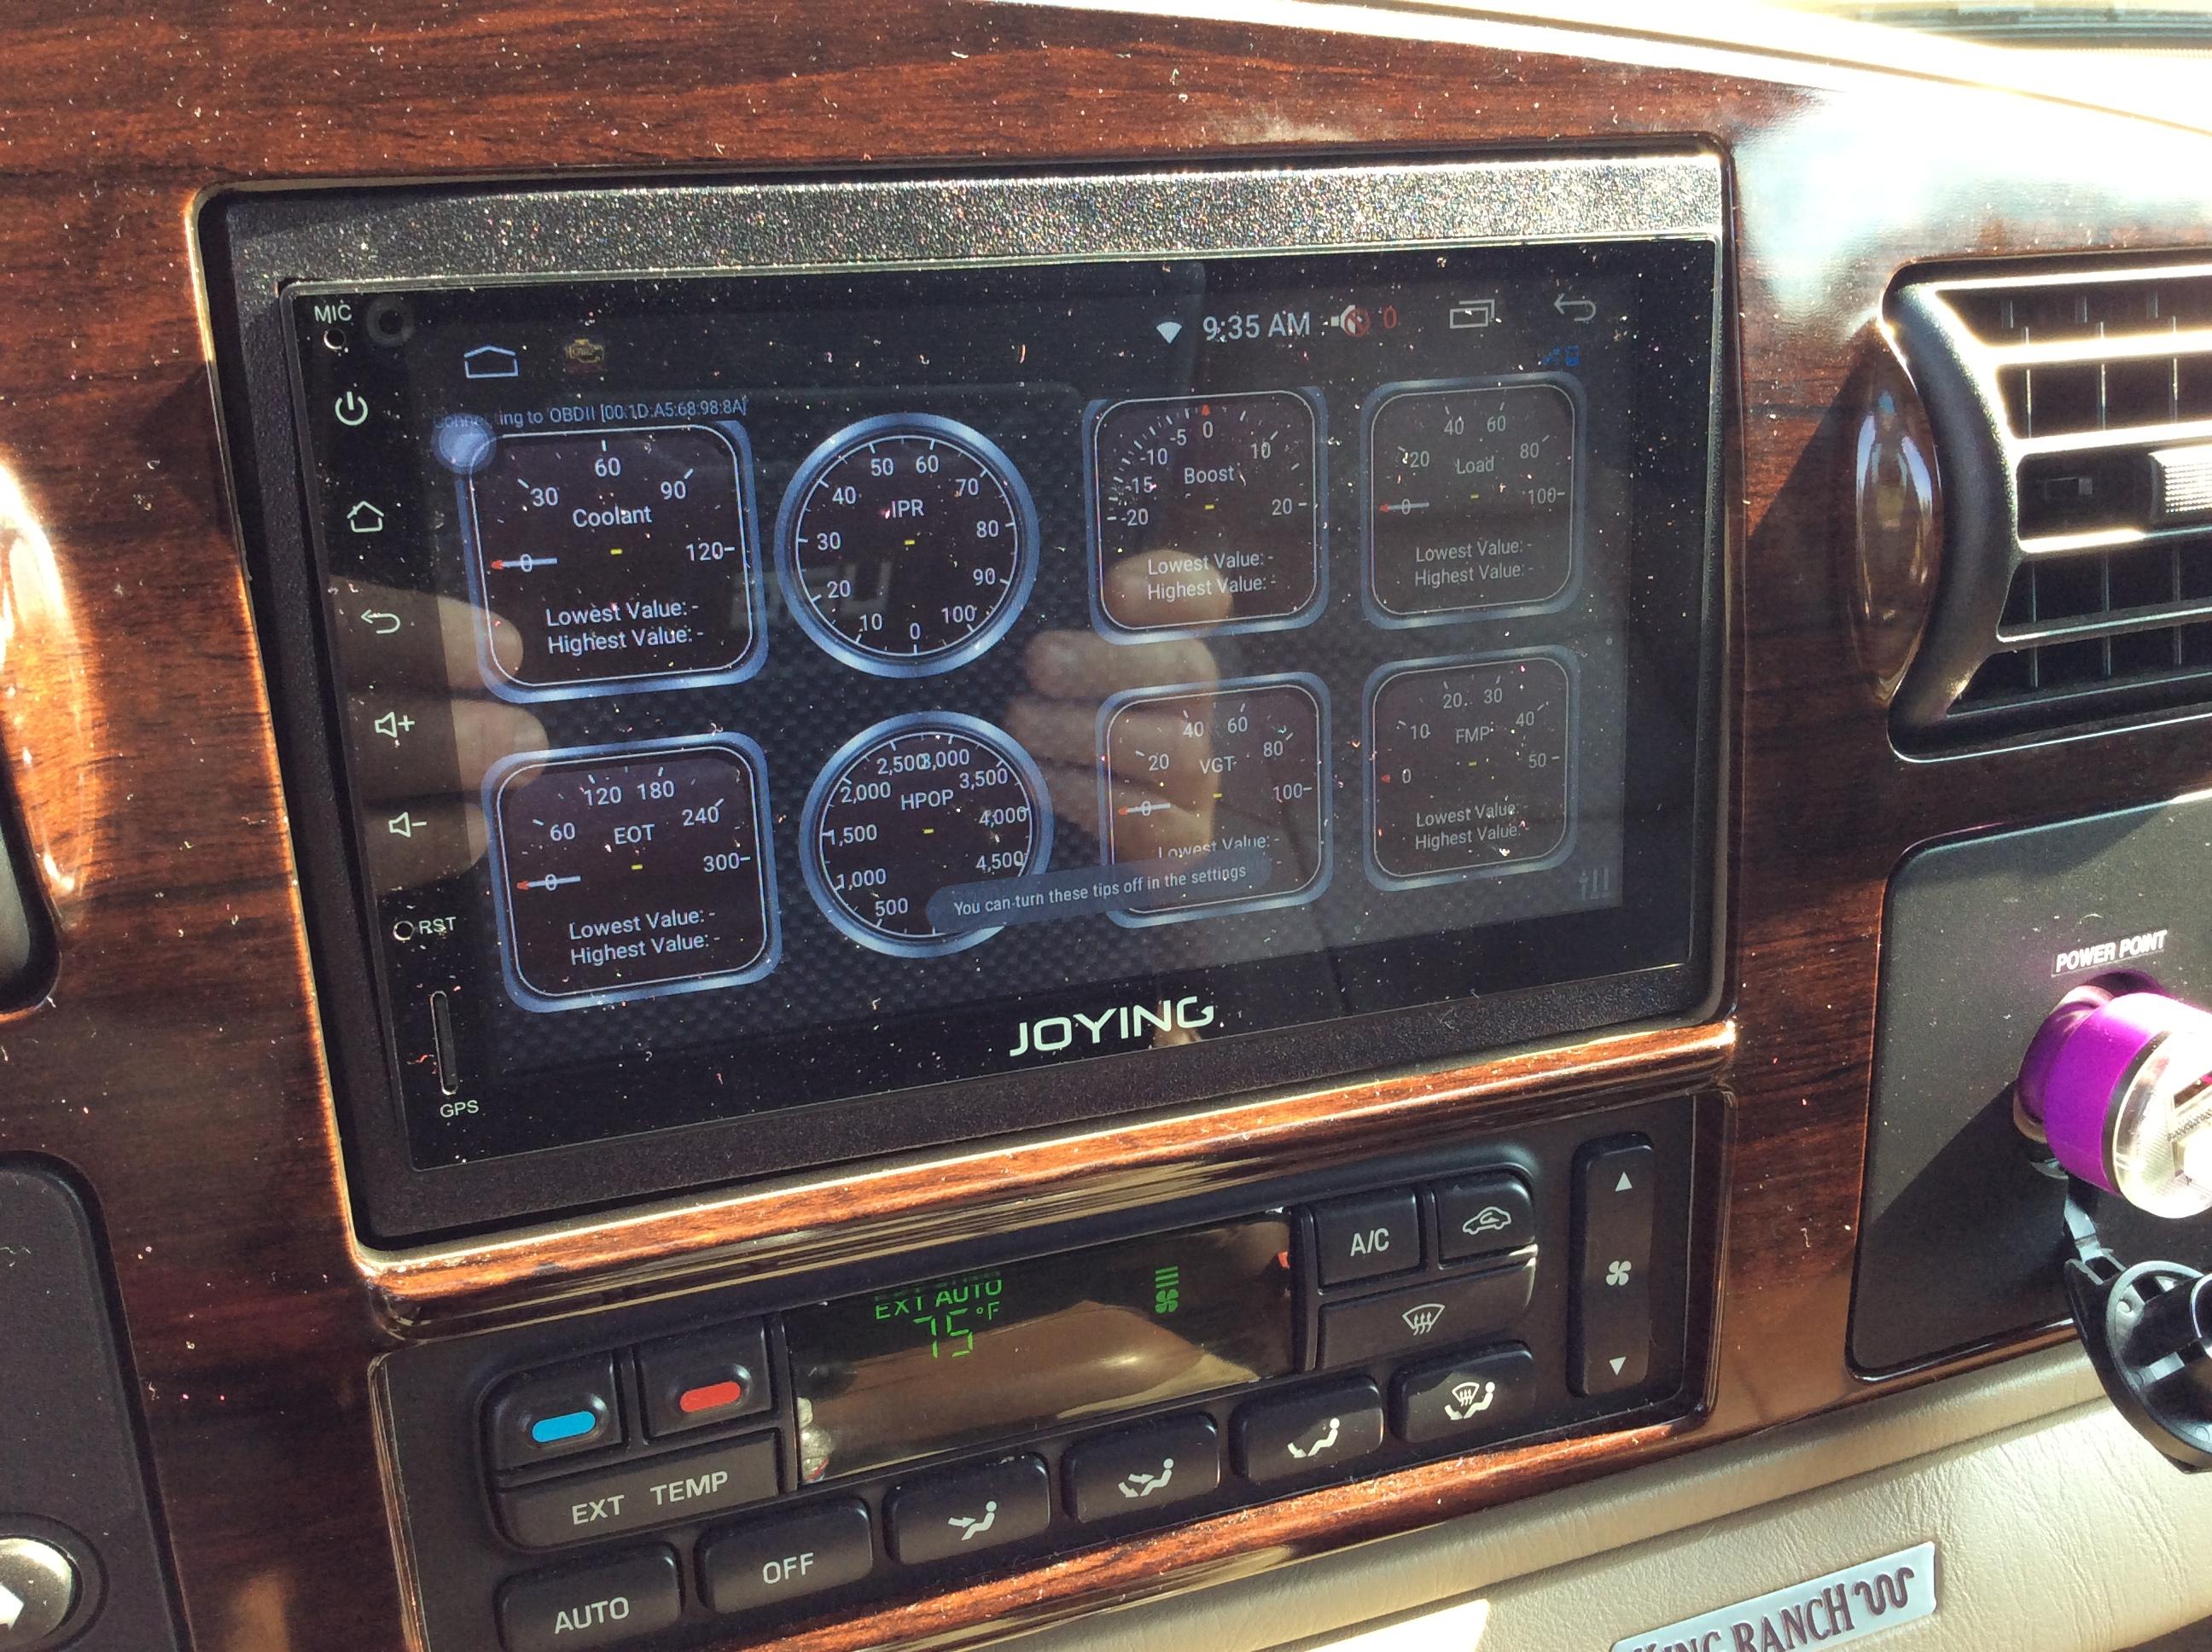 seeking monitoring scan/tuner direction, 6 0 - Ford Powerstroke